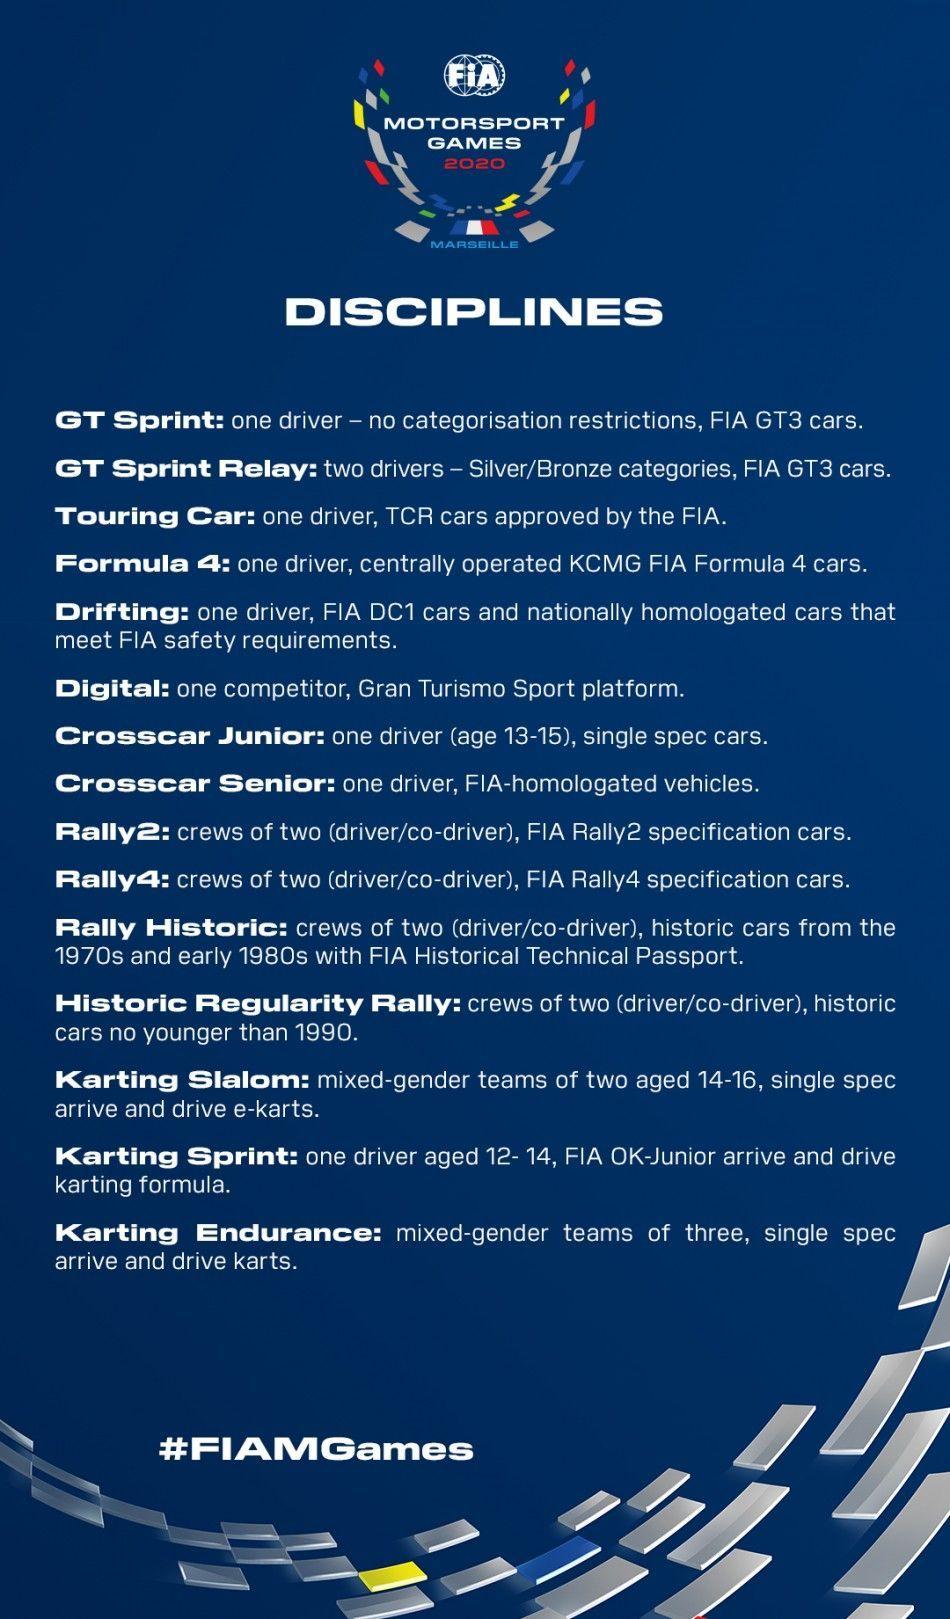 FIA, Motorsport Games